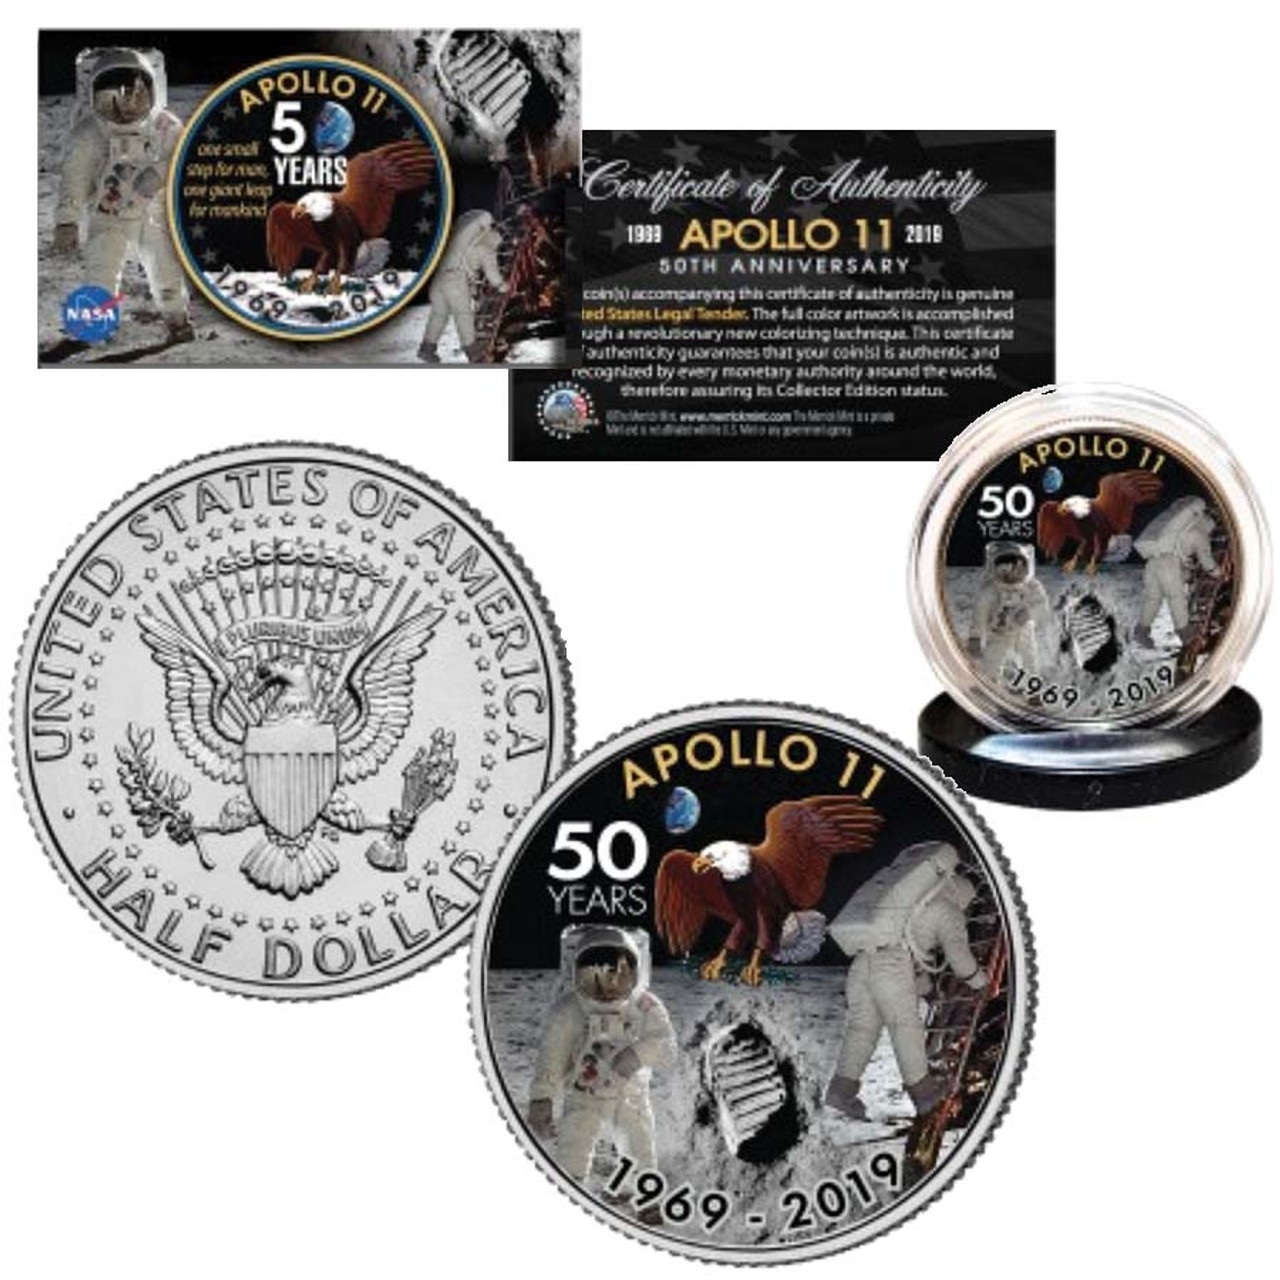 Apollo 11 50th Anniversary Colorized Kennedy Half Dollar Image 1